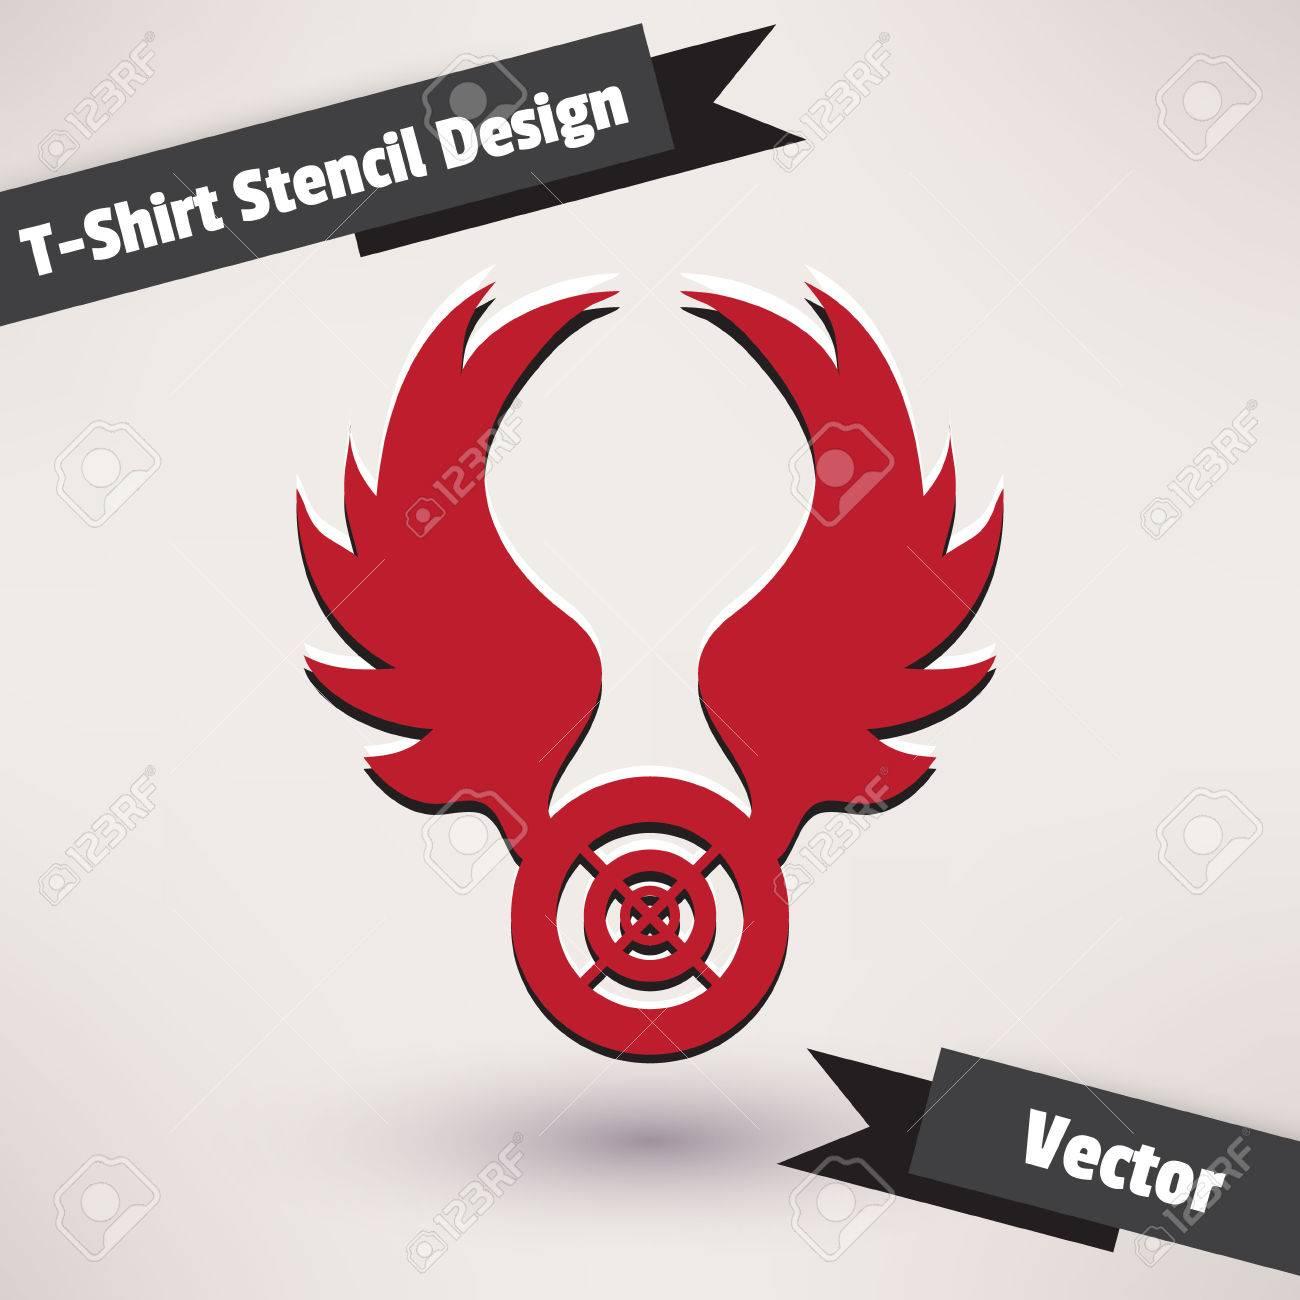 Shirt design illustrator template - T Shirt Stencil Design Vector Illustration Template For Your Design Stock Vector